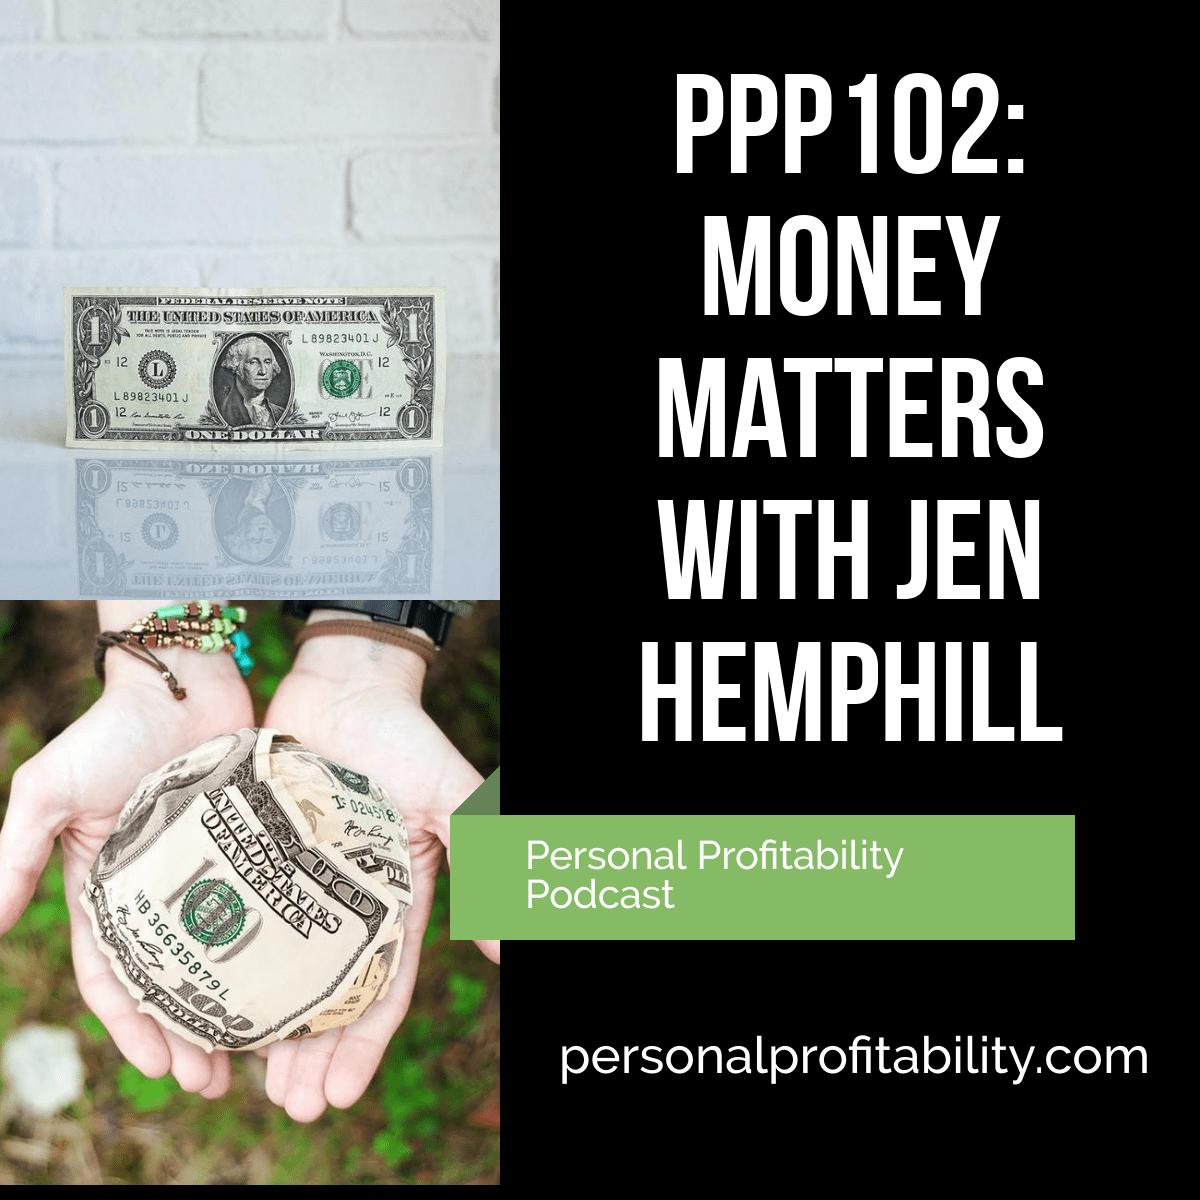 Ppp102 Money Matters With Jen Hemphill